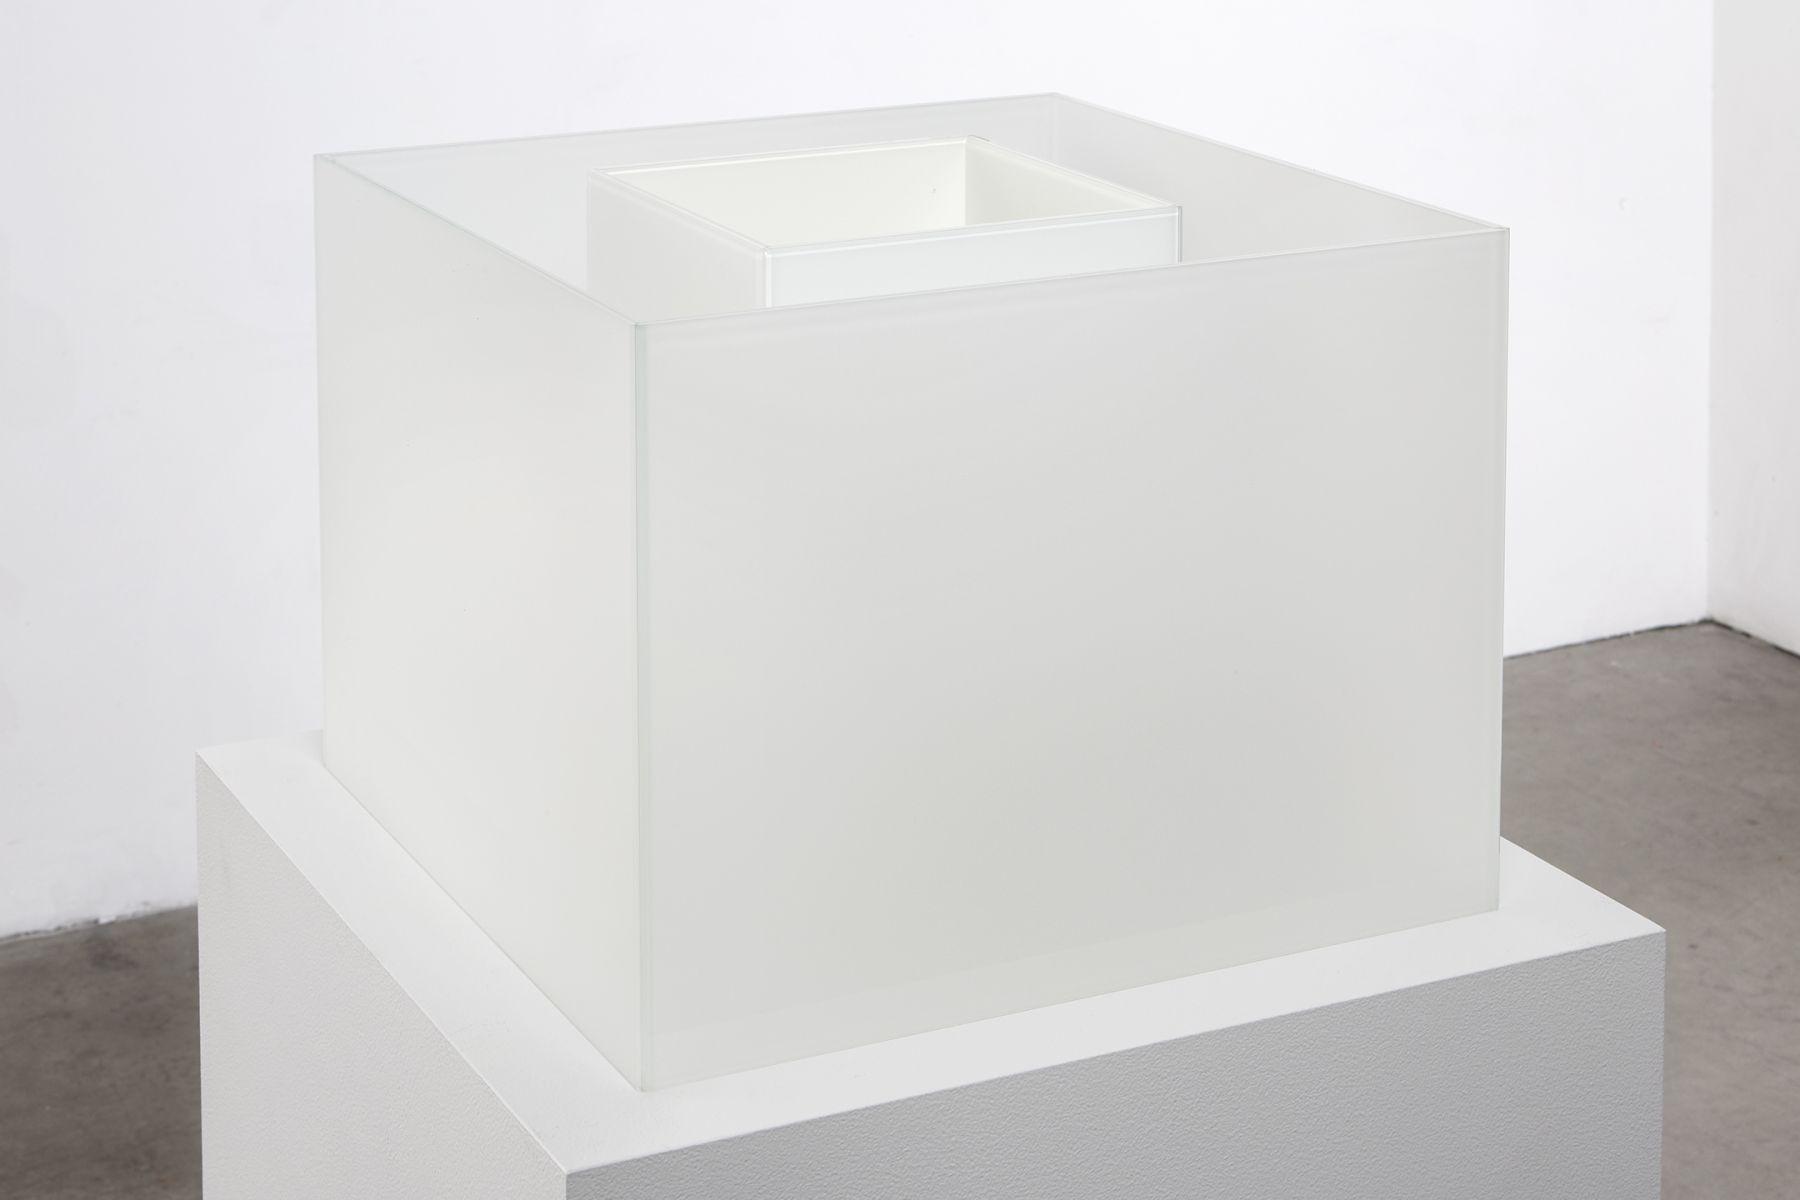 "ALT=""Larry Bell, Untitled Maquette (True Fog / Optimum White), 2018, Laminated glass cube"""